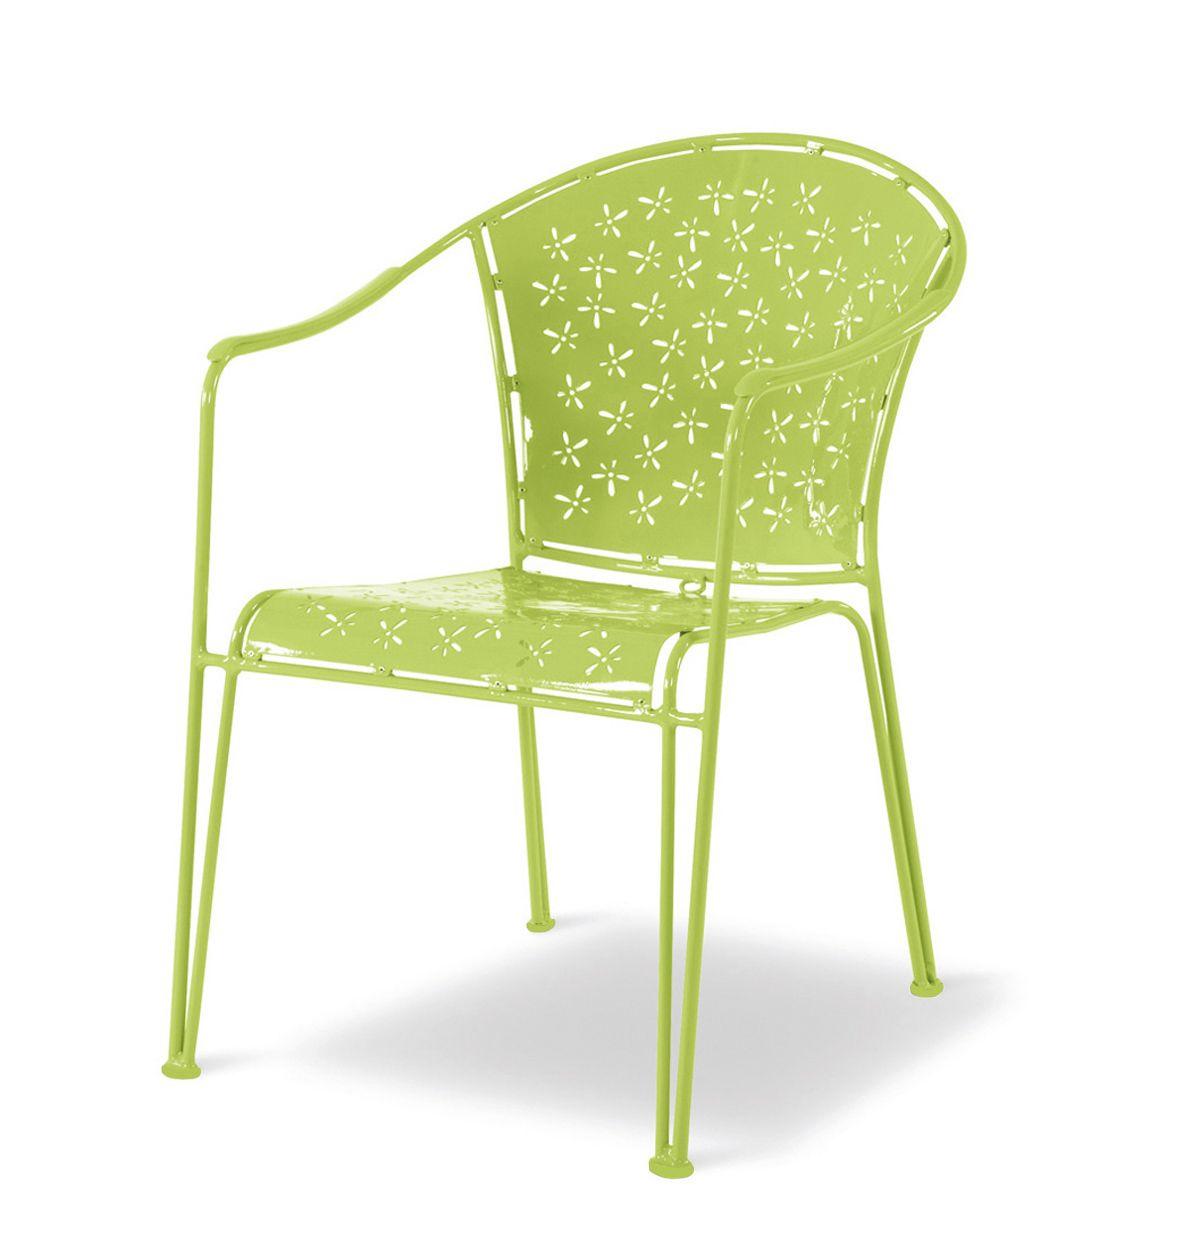 Kettler Sereno Patio Chair Retro Patio Patio Chairs Furniture